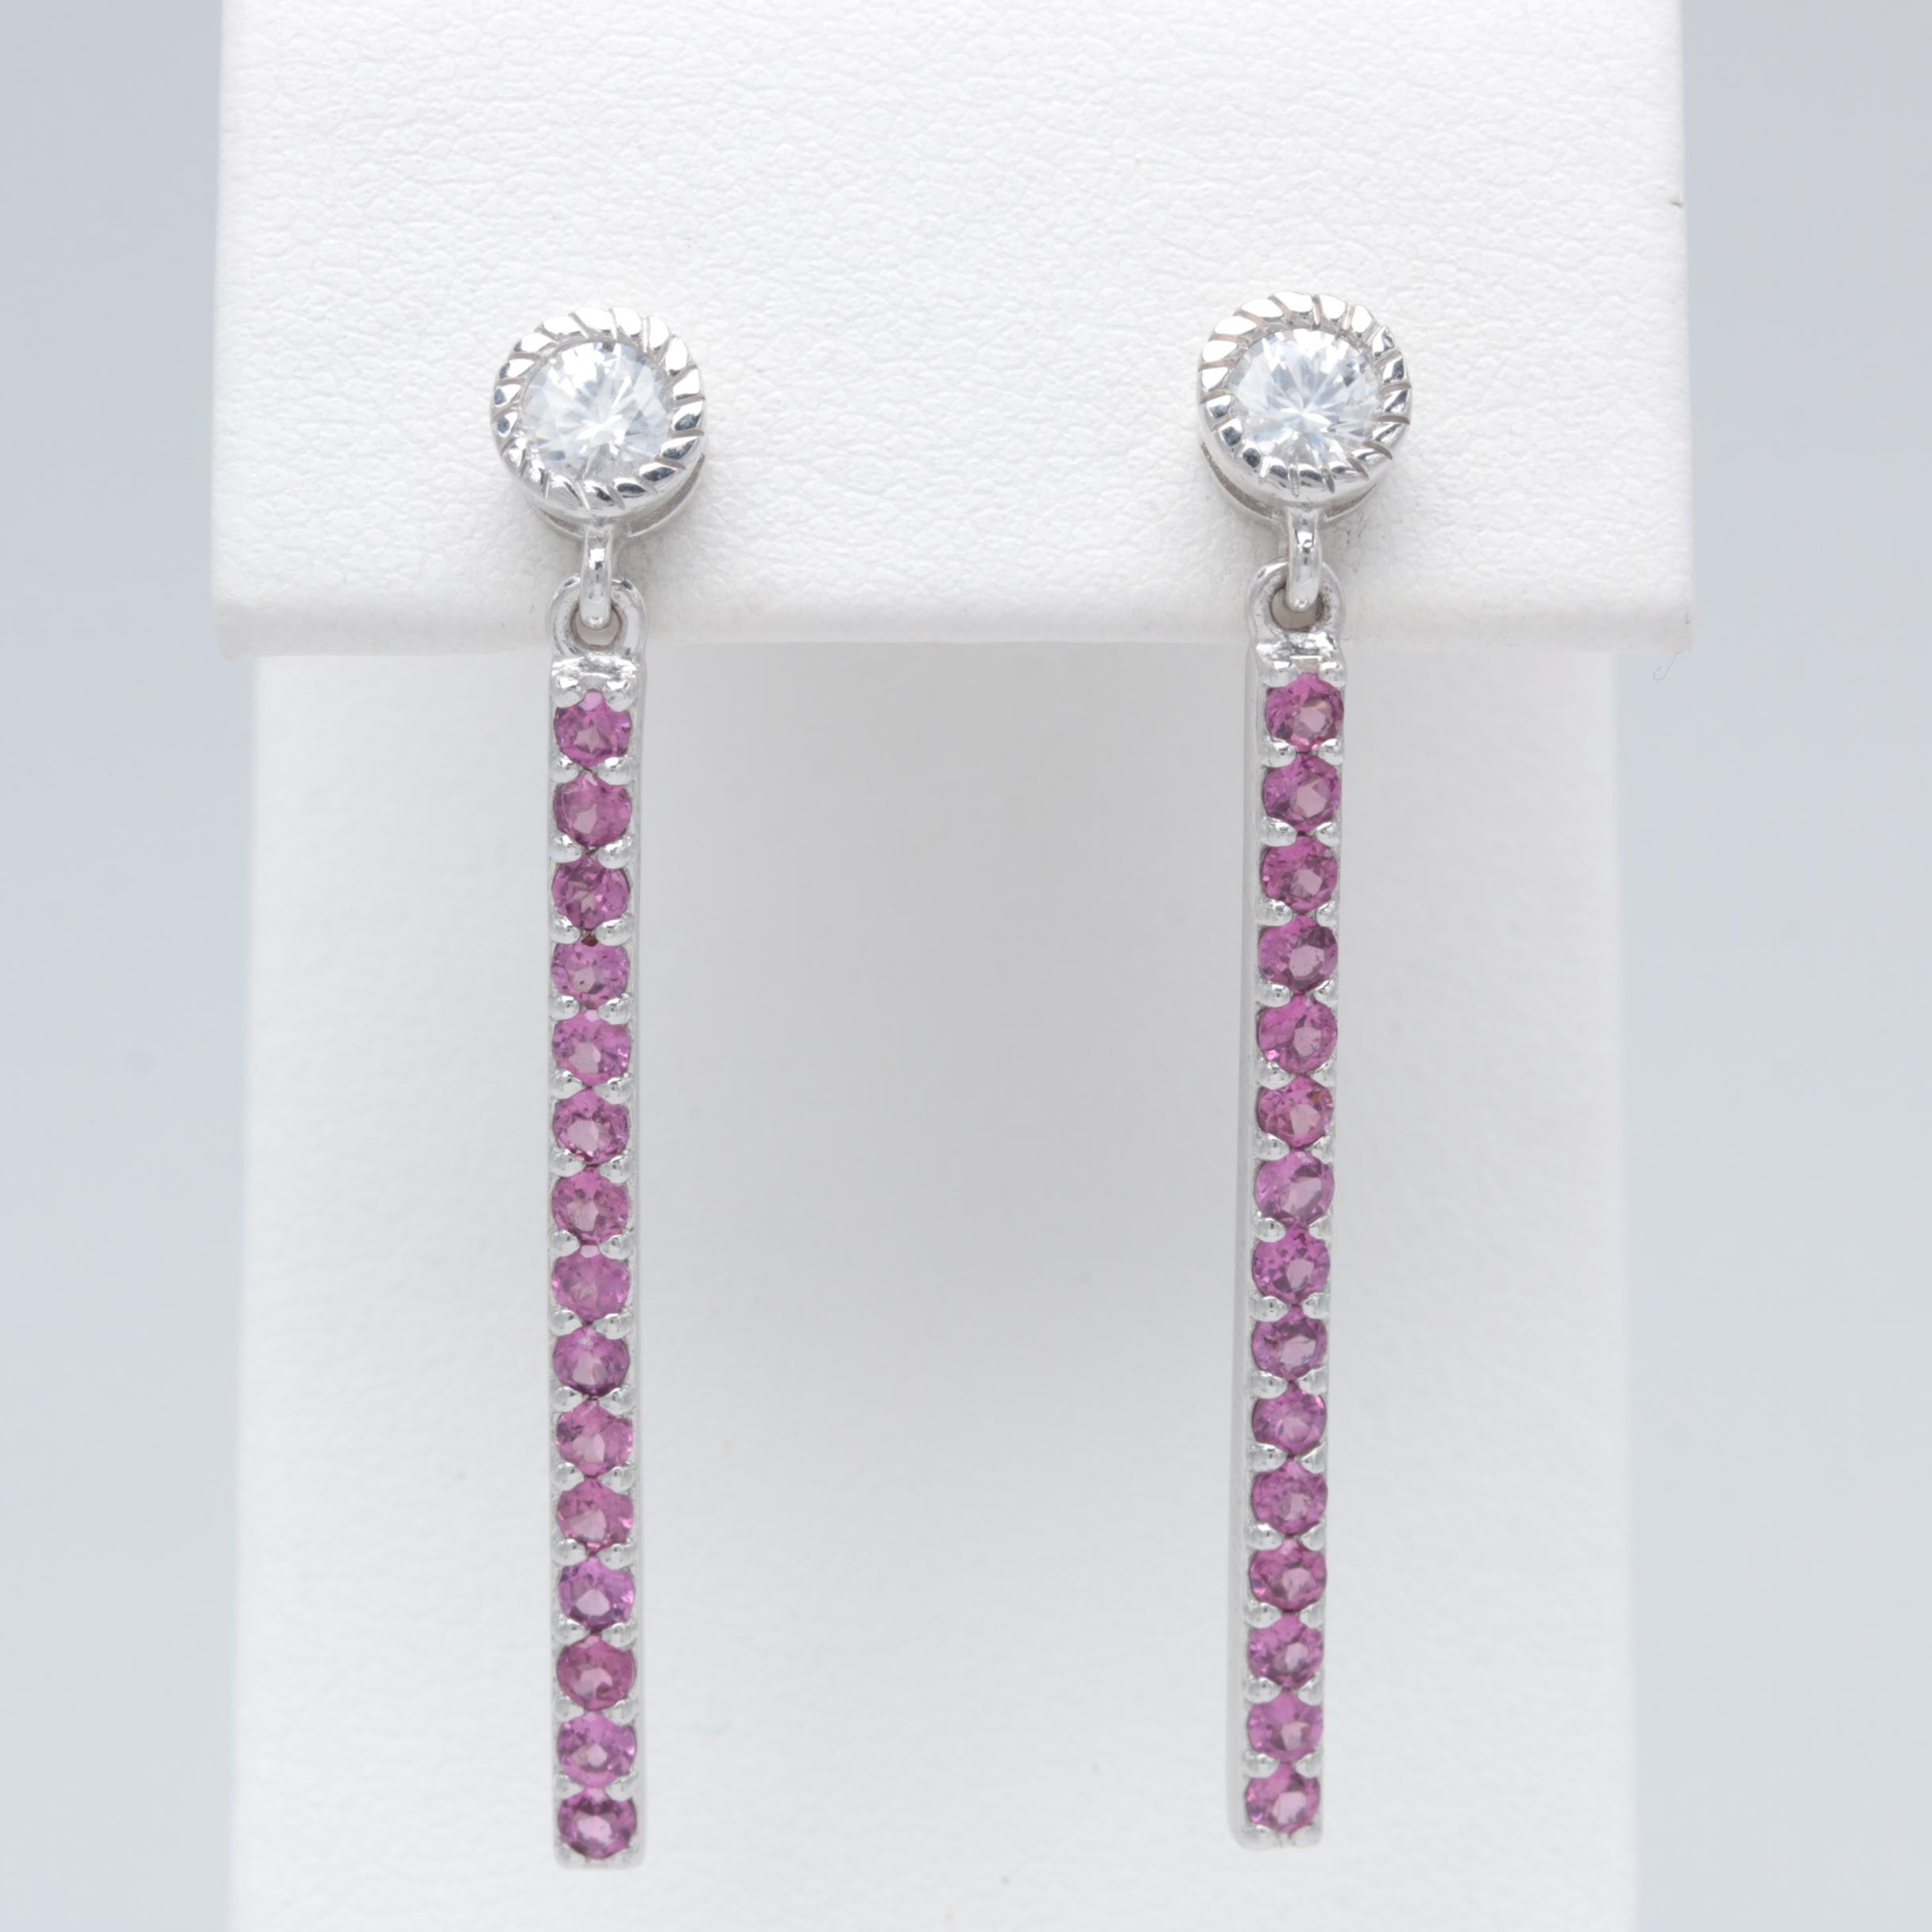 Robert Manse Sterling Silver Garnet and Zircon Dangle Earrings